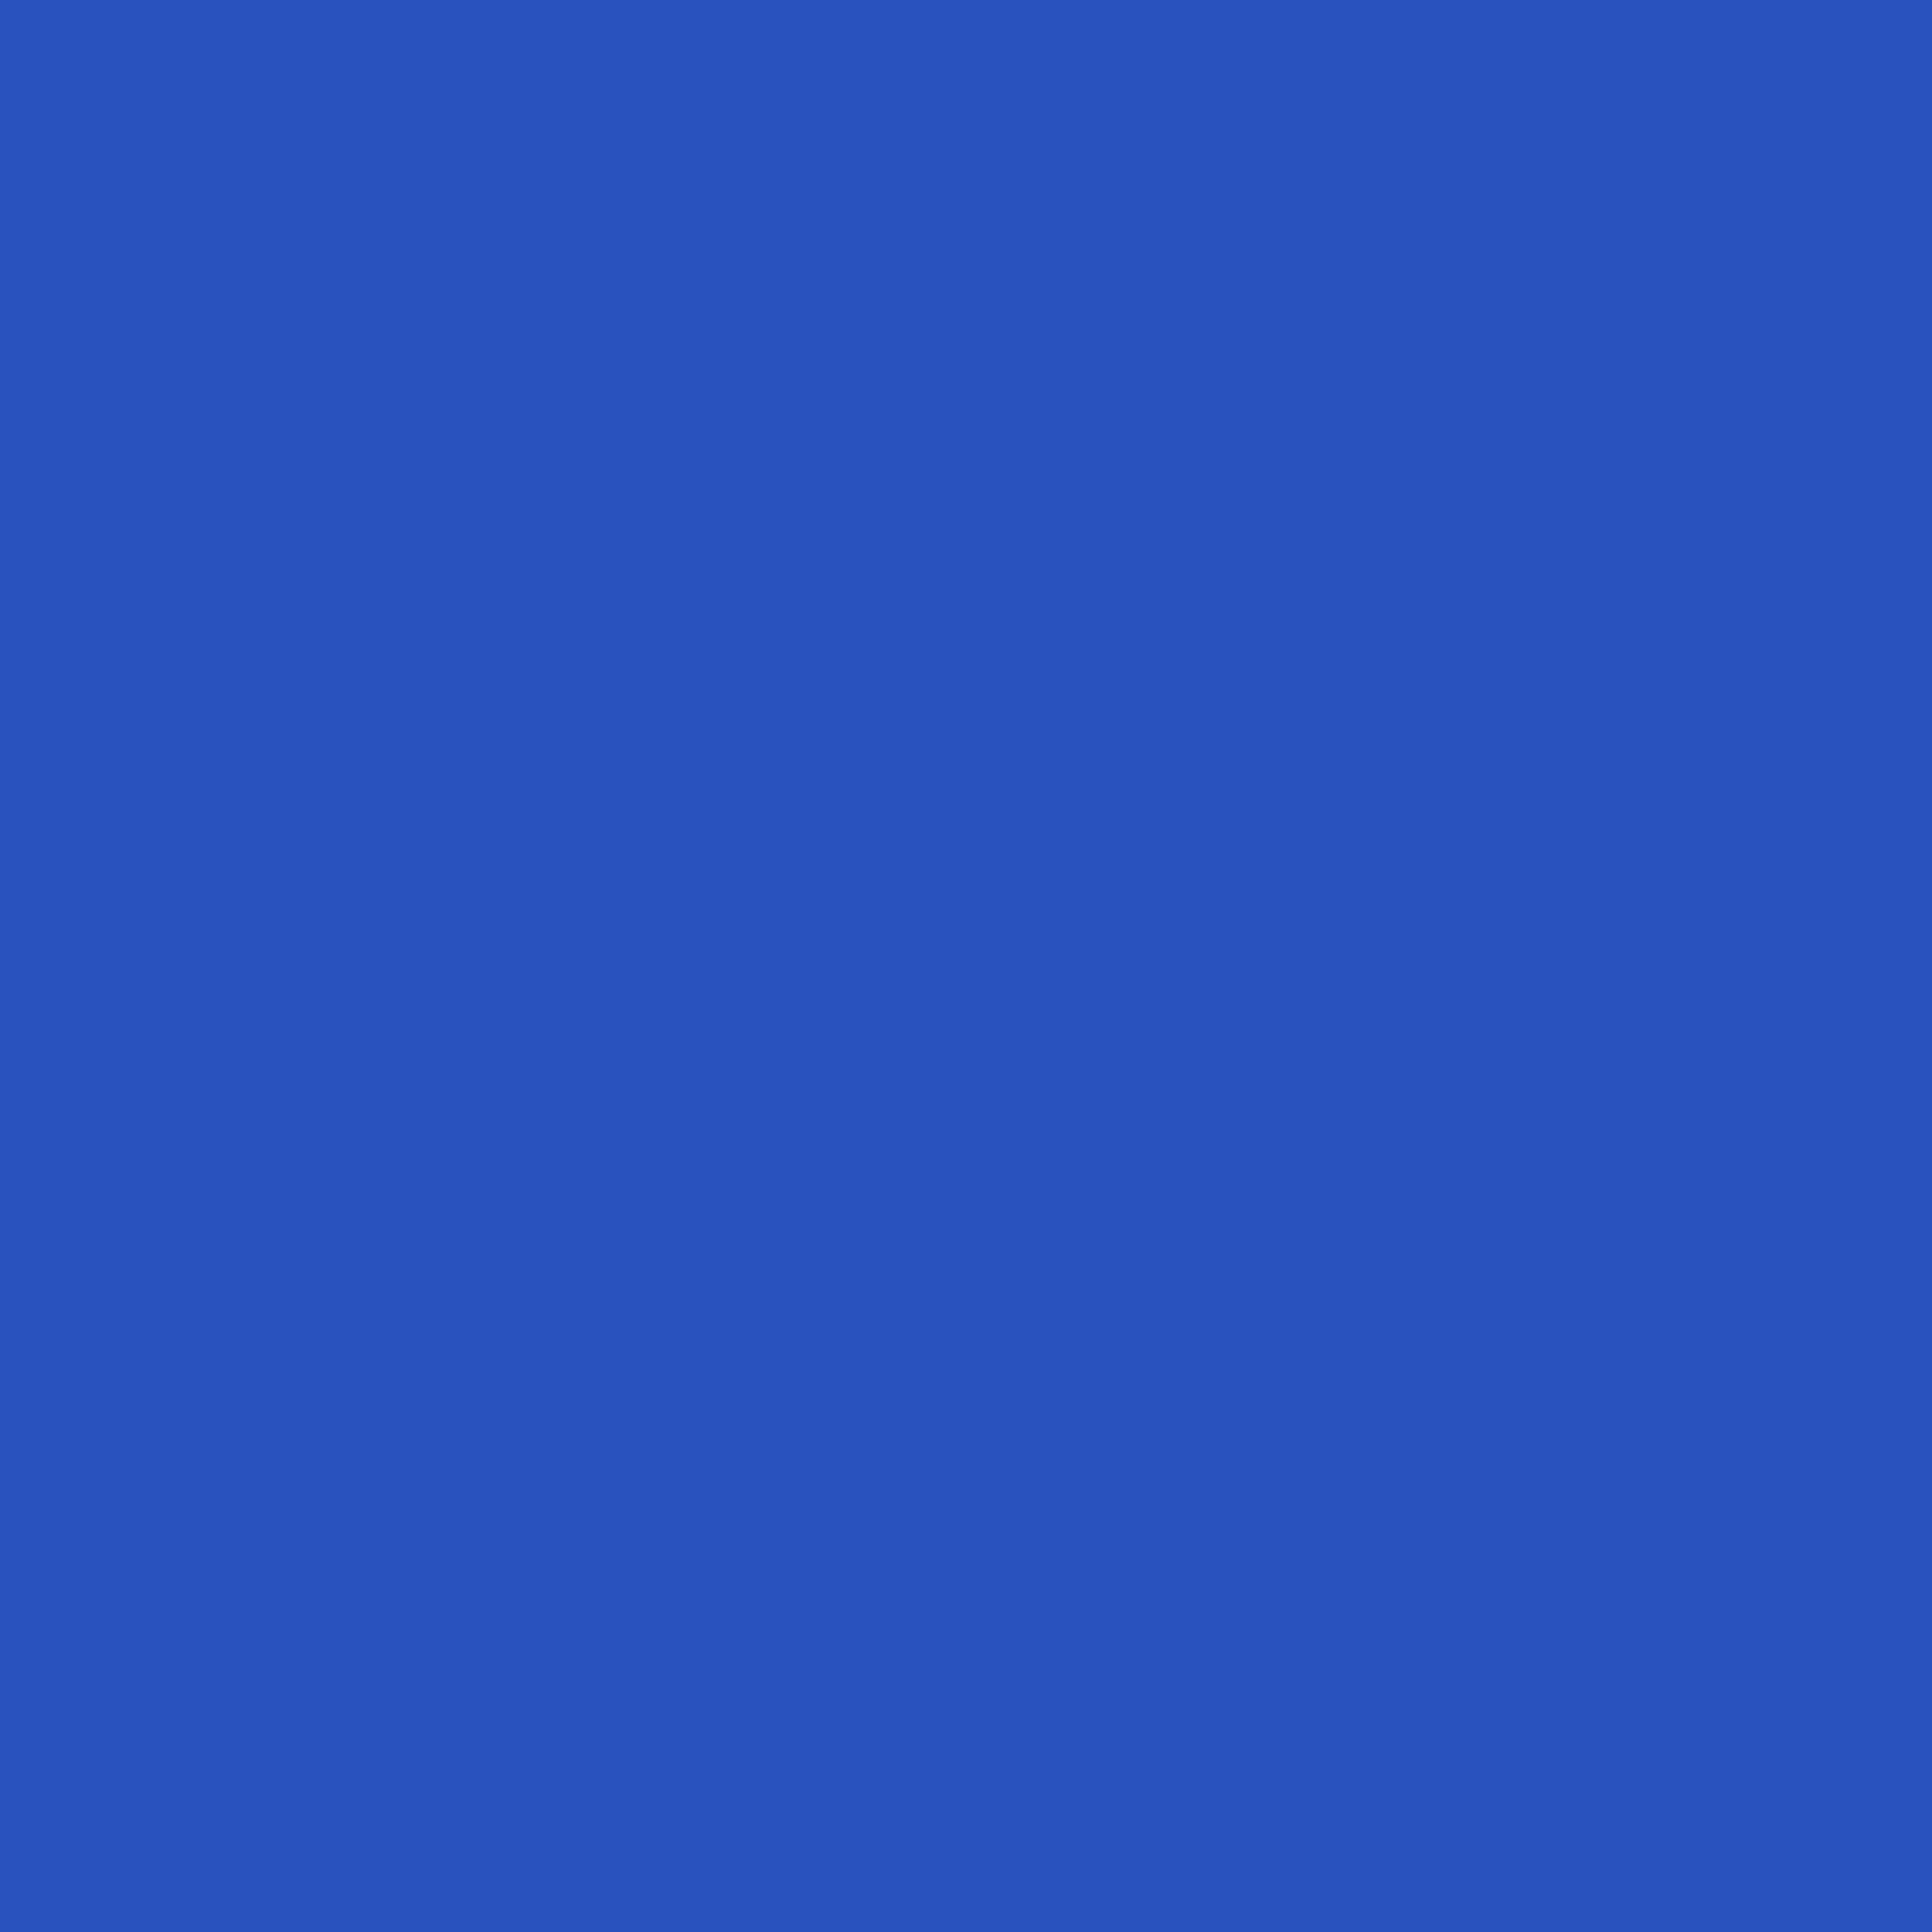 2048x2048 Cerulean Blue Solid Color Background